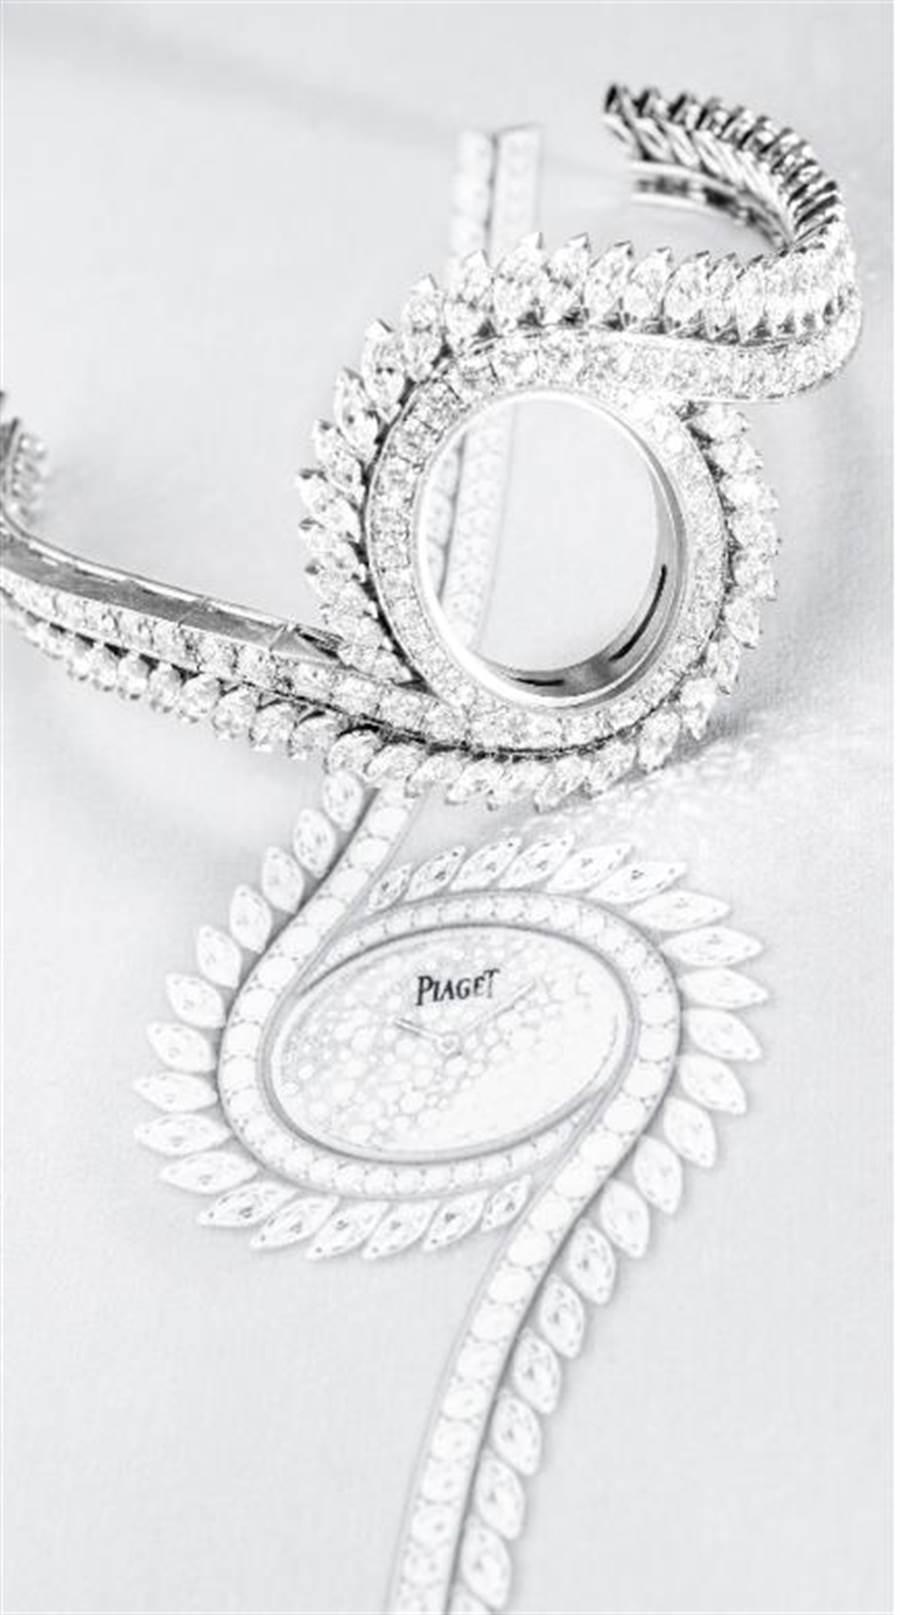 PIAGET Limelight Gala系列18K白金鑲鑽頂級珠寶腕表,2020年Limelight Gala系列珠寶腕錶推出的頂級款式,全球首次曝光,1110萬元。(台北101提供)